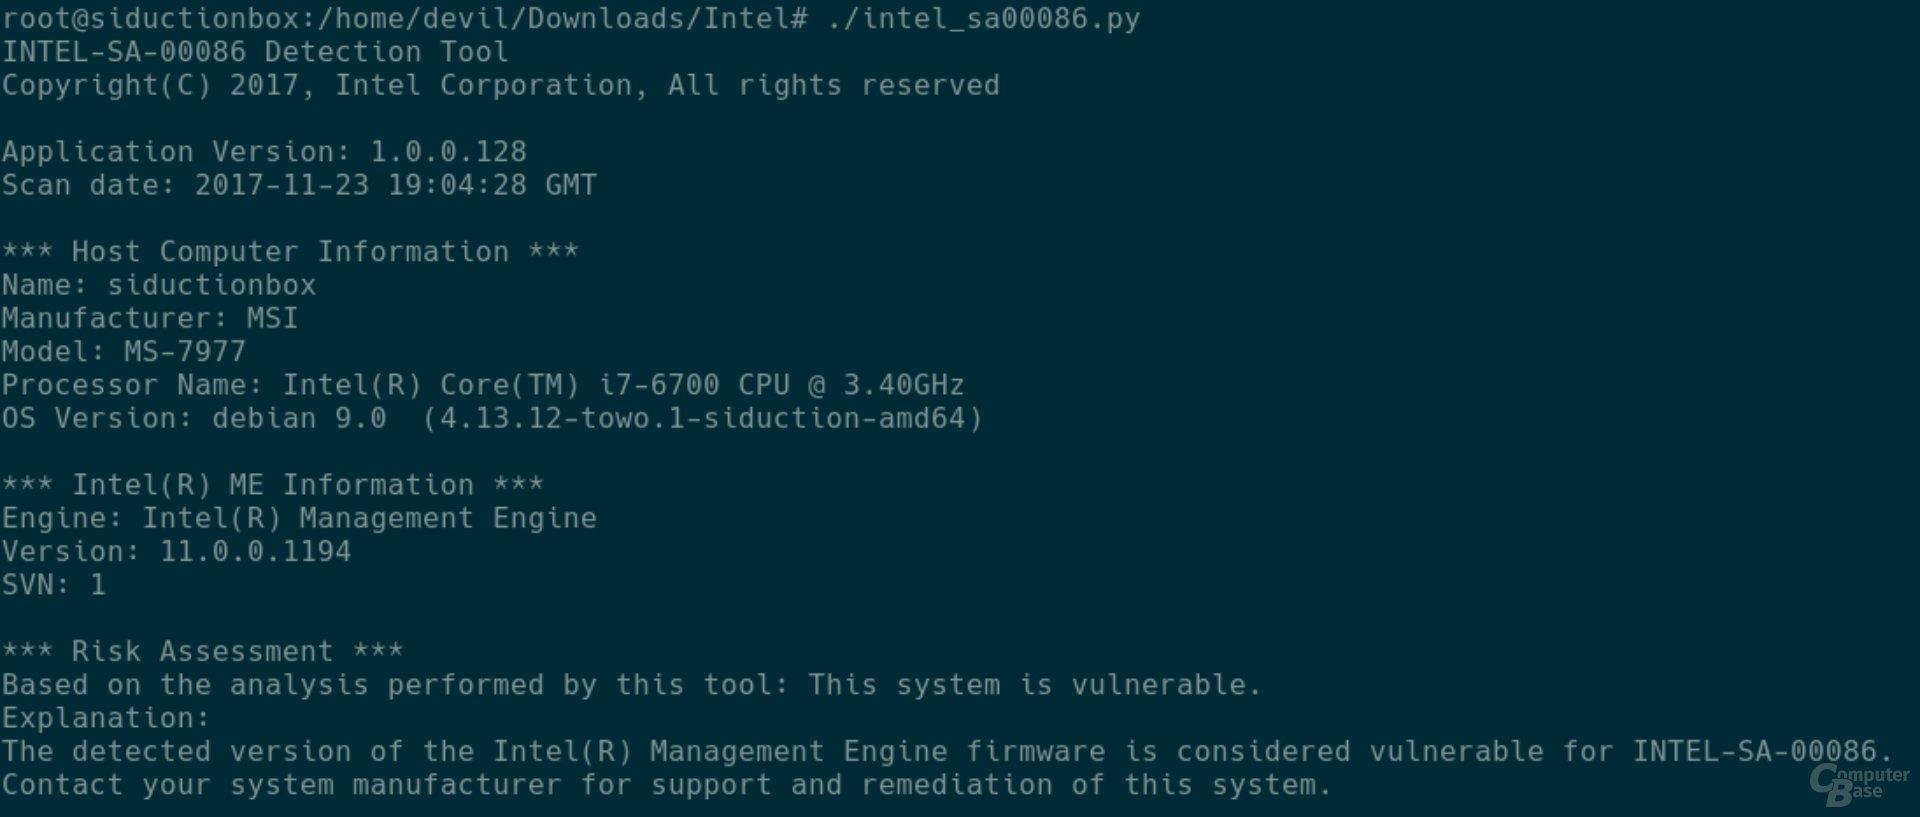 Betroffene Linux-Workstation